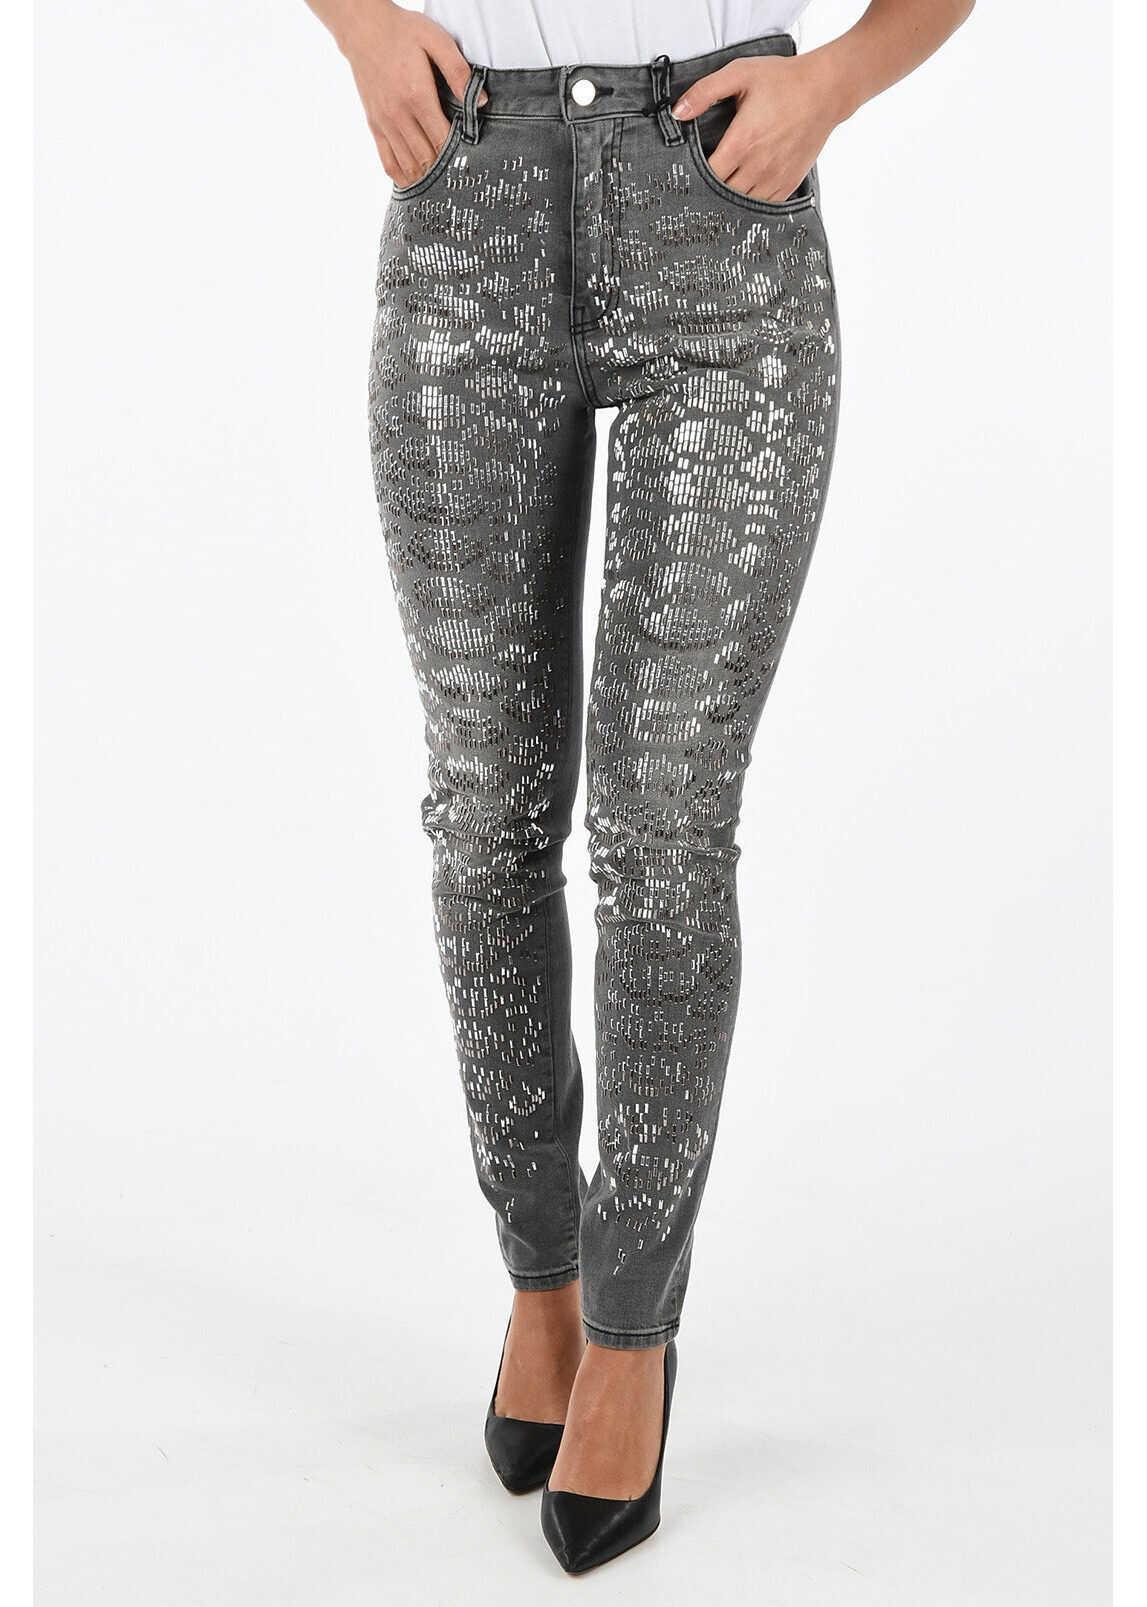 Just Cavalli Studded Slim Fit Jeans GRAY